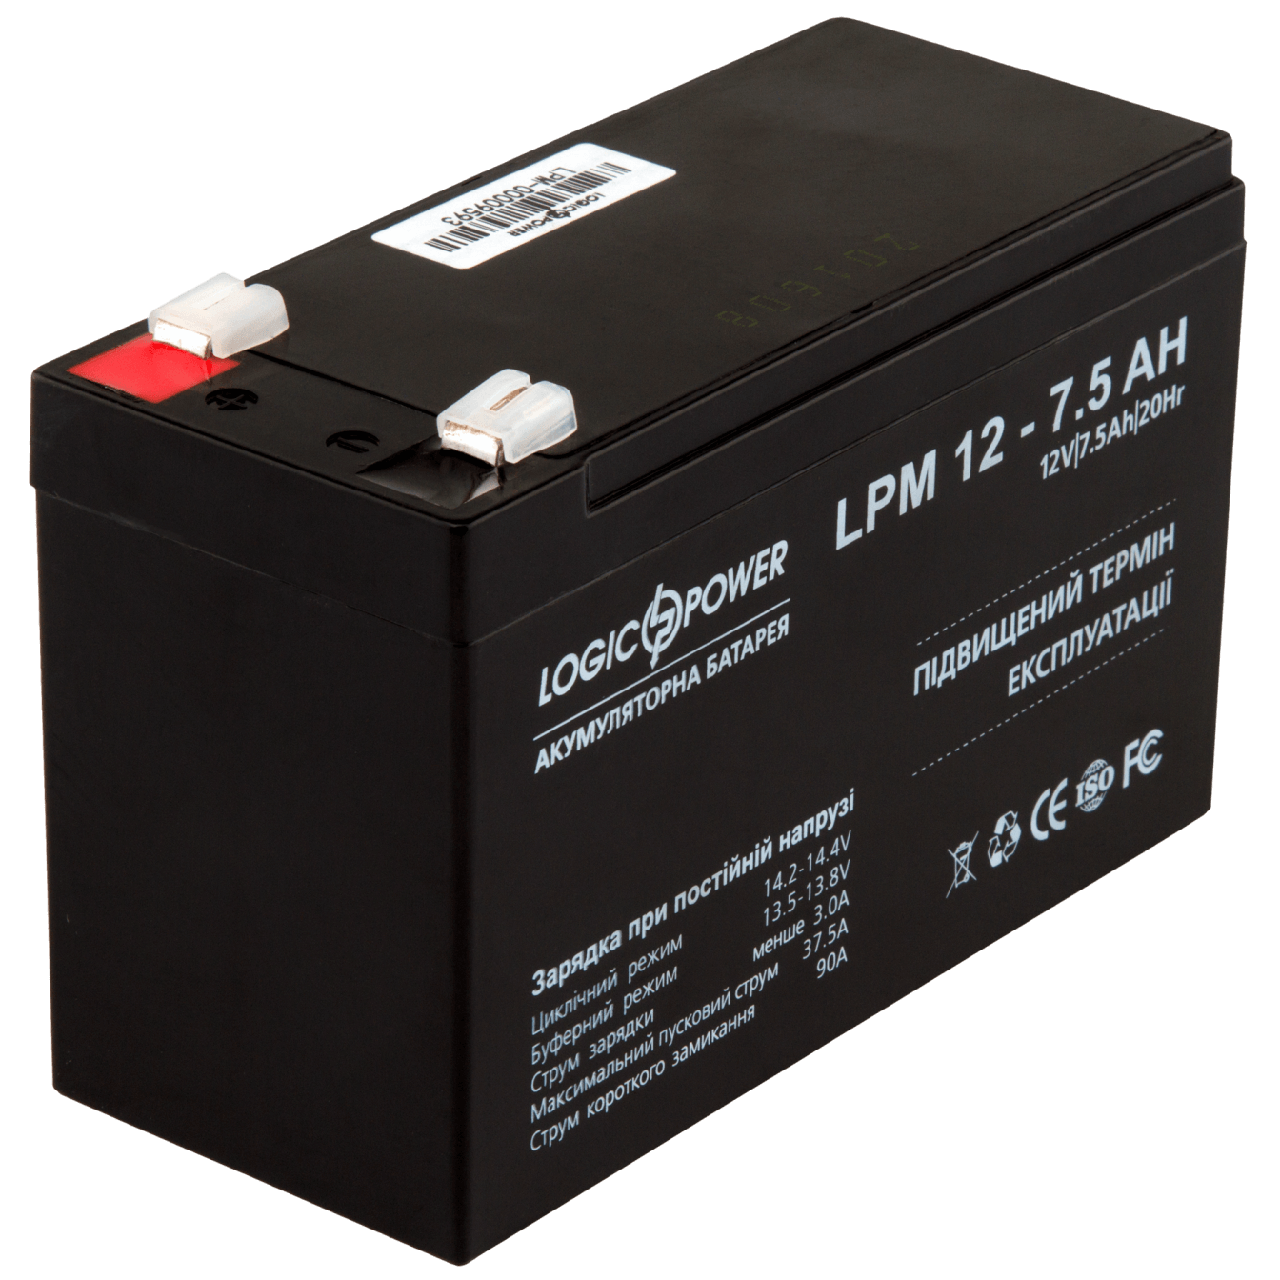 Аккумулятор LPM 12 - 7,5 AH